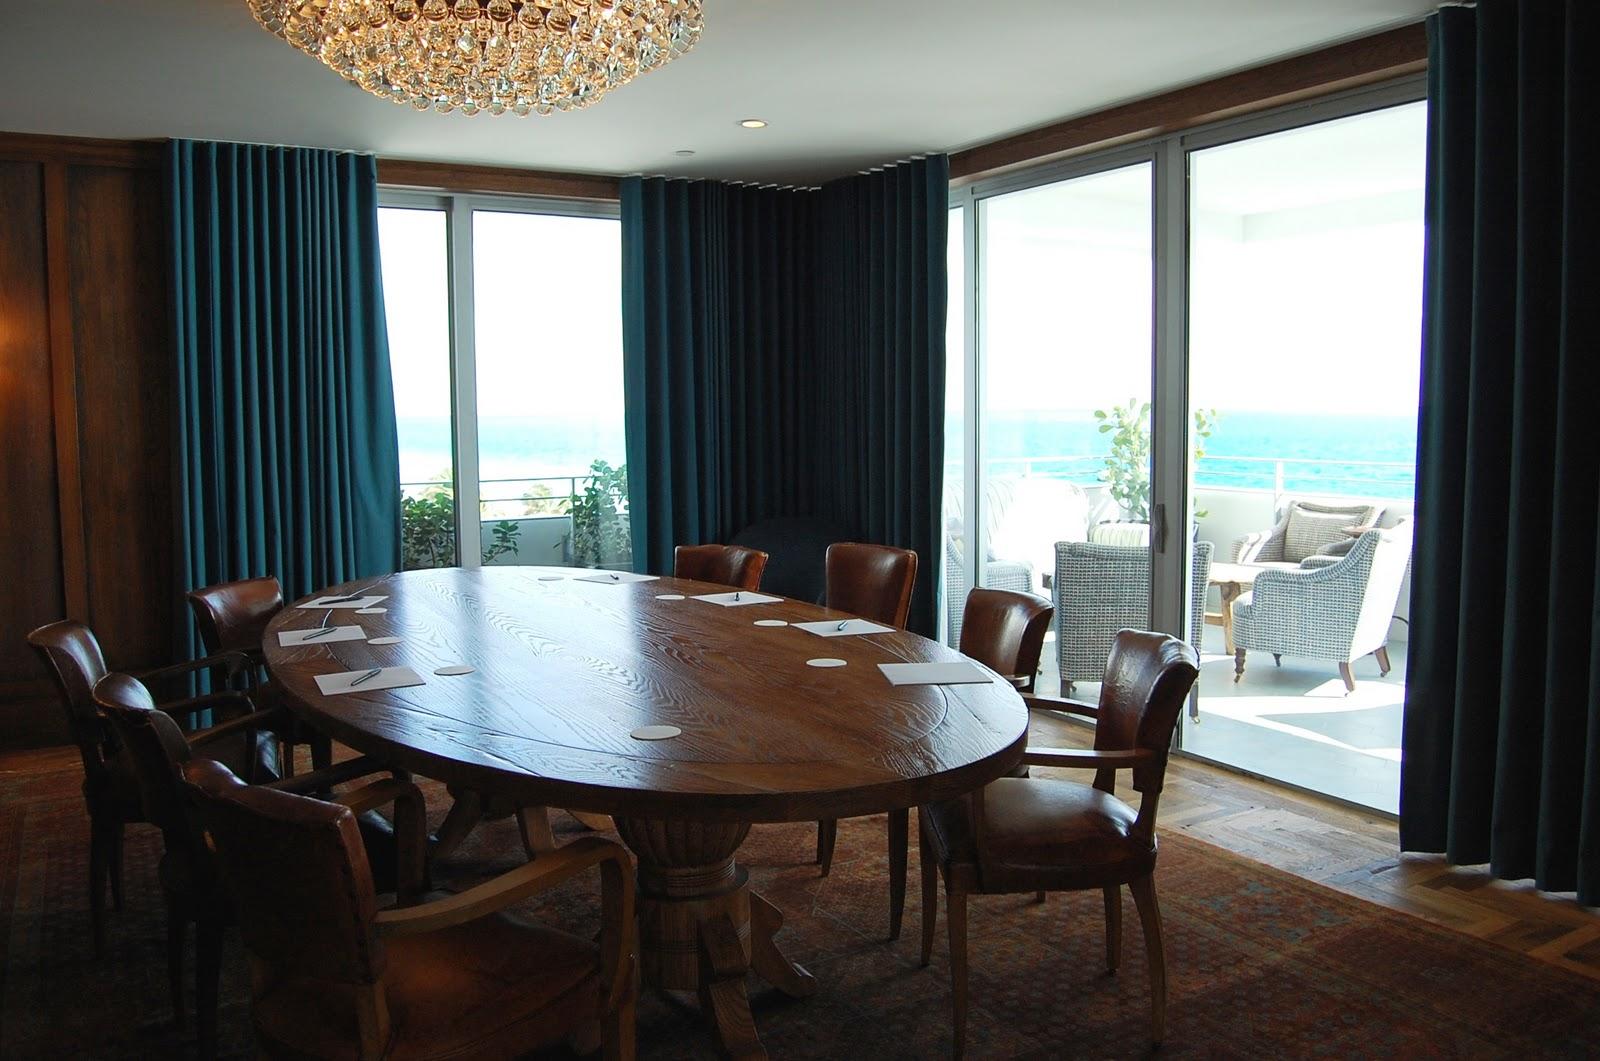 Soho Beach House Miami: More Interiors | Ellegant Home Design